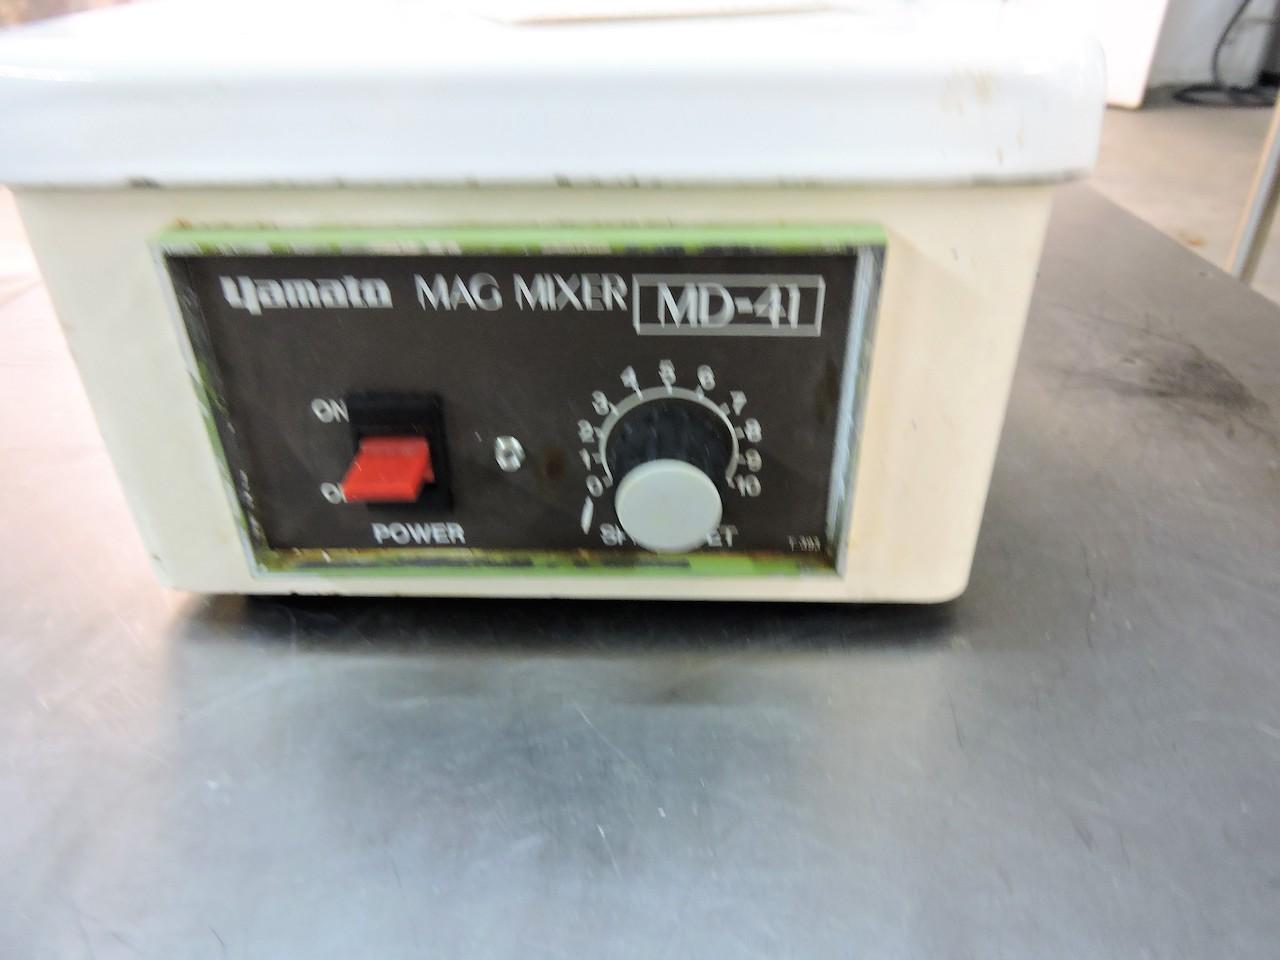 Lot 14 - YAMATO SCIENTIFIC MODEL MD41 MAGNETIC MIXER